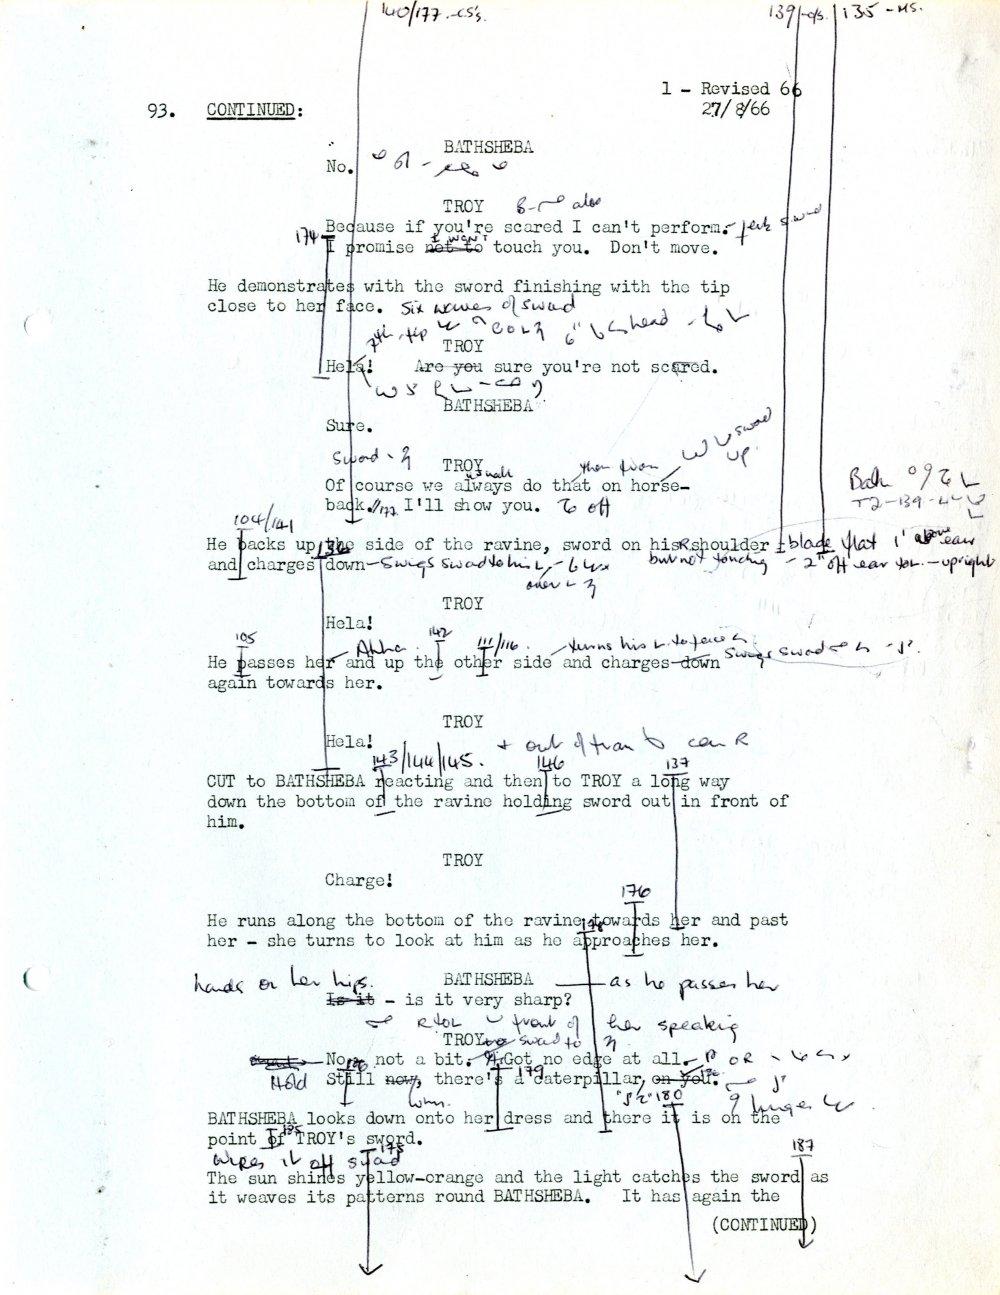 Later continuity script